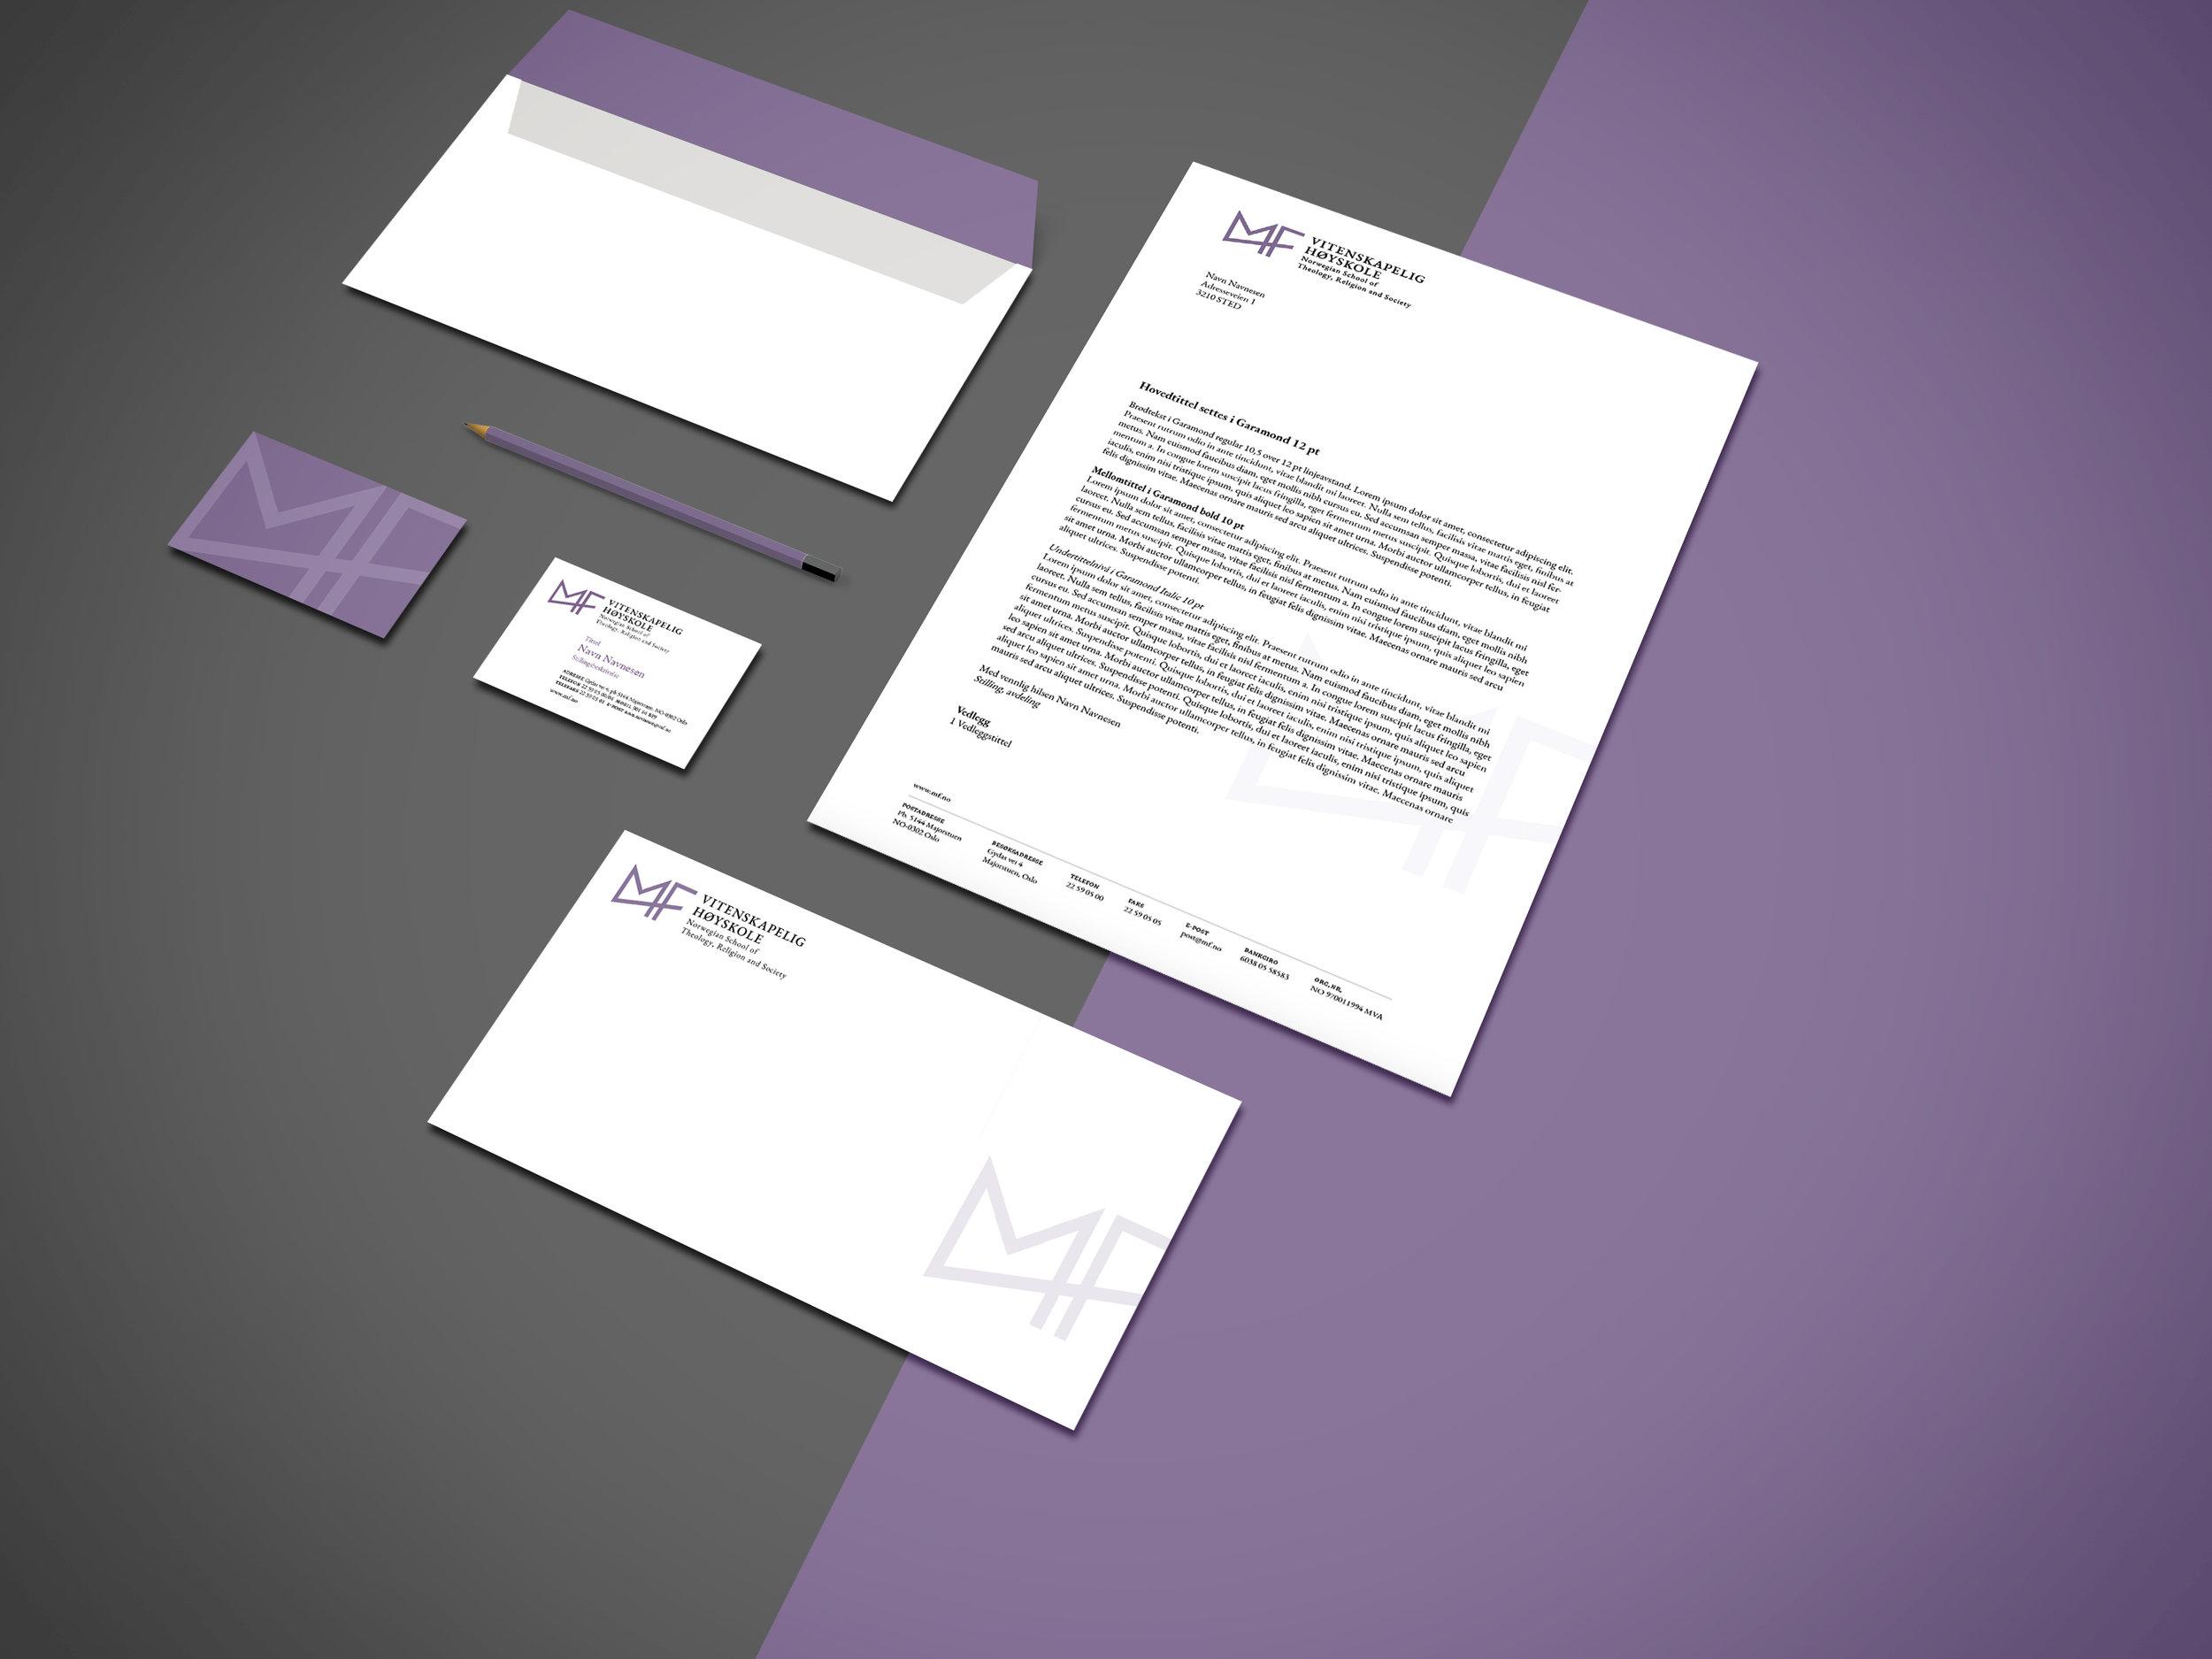 Stationery-Mockup-MF-brevark.jpg